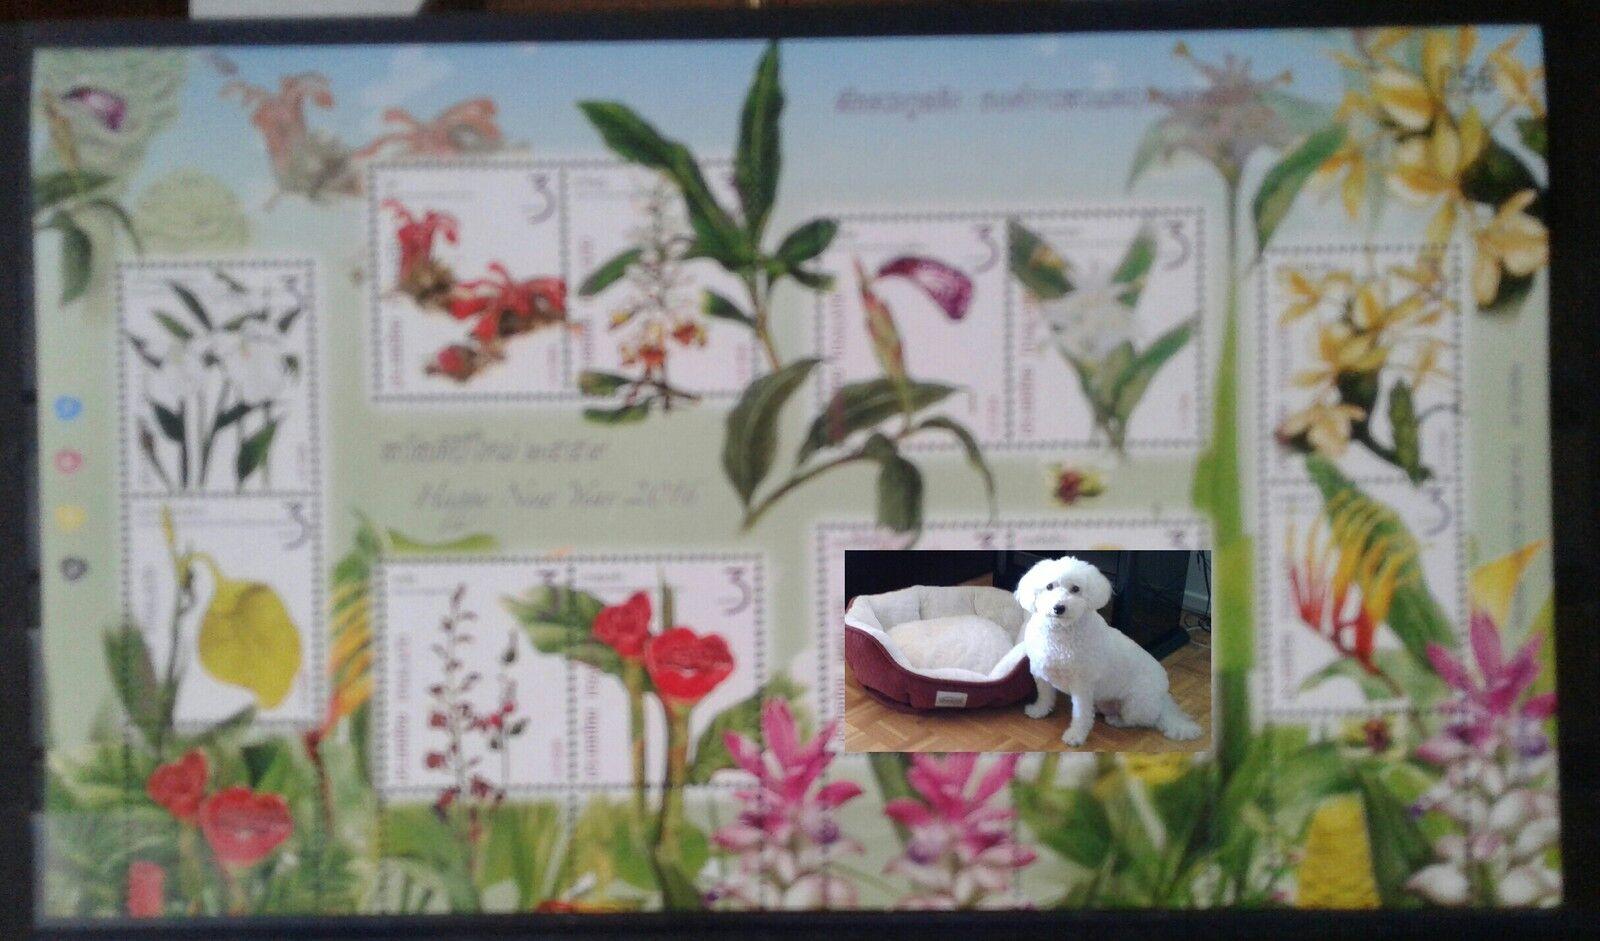 marie-lisrenau0-milou,stamps